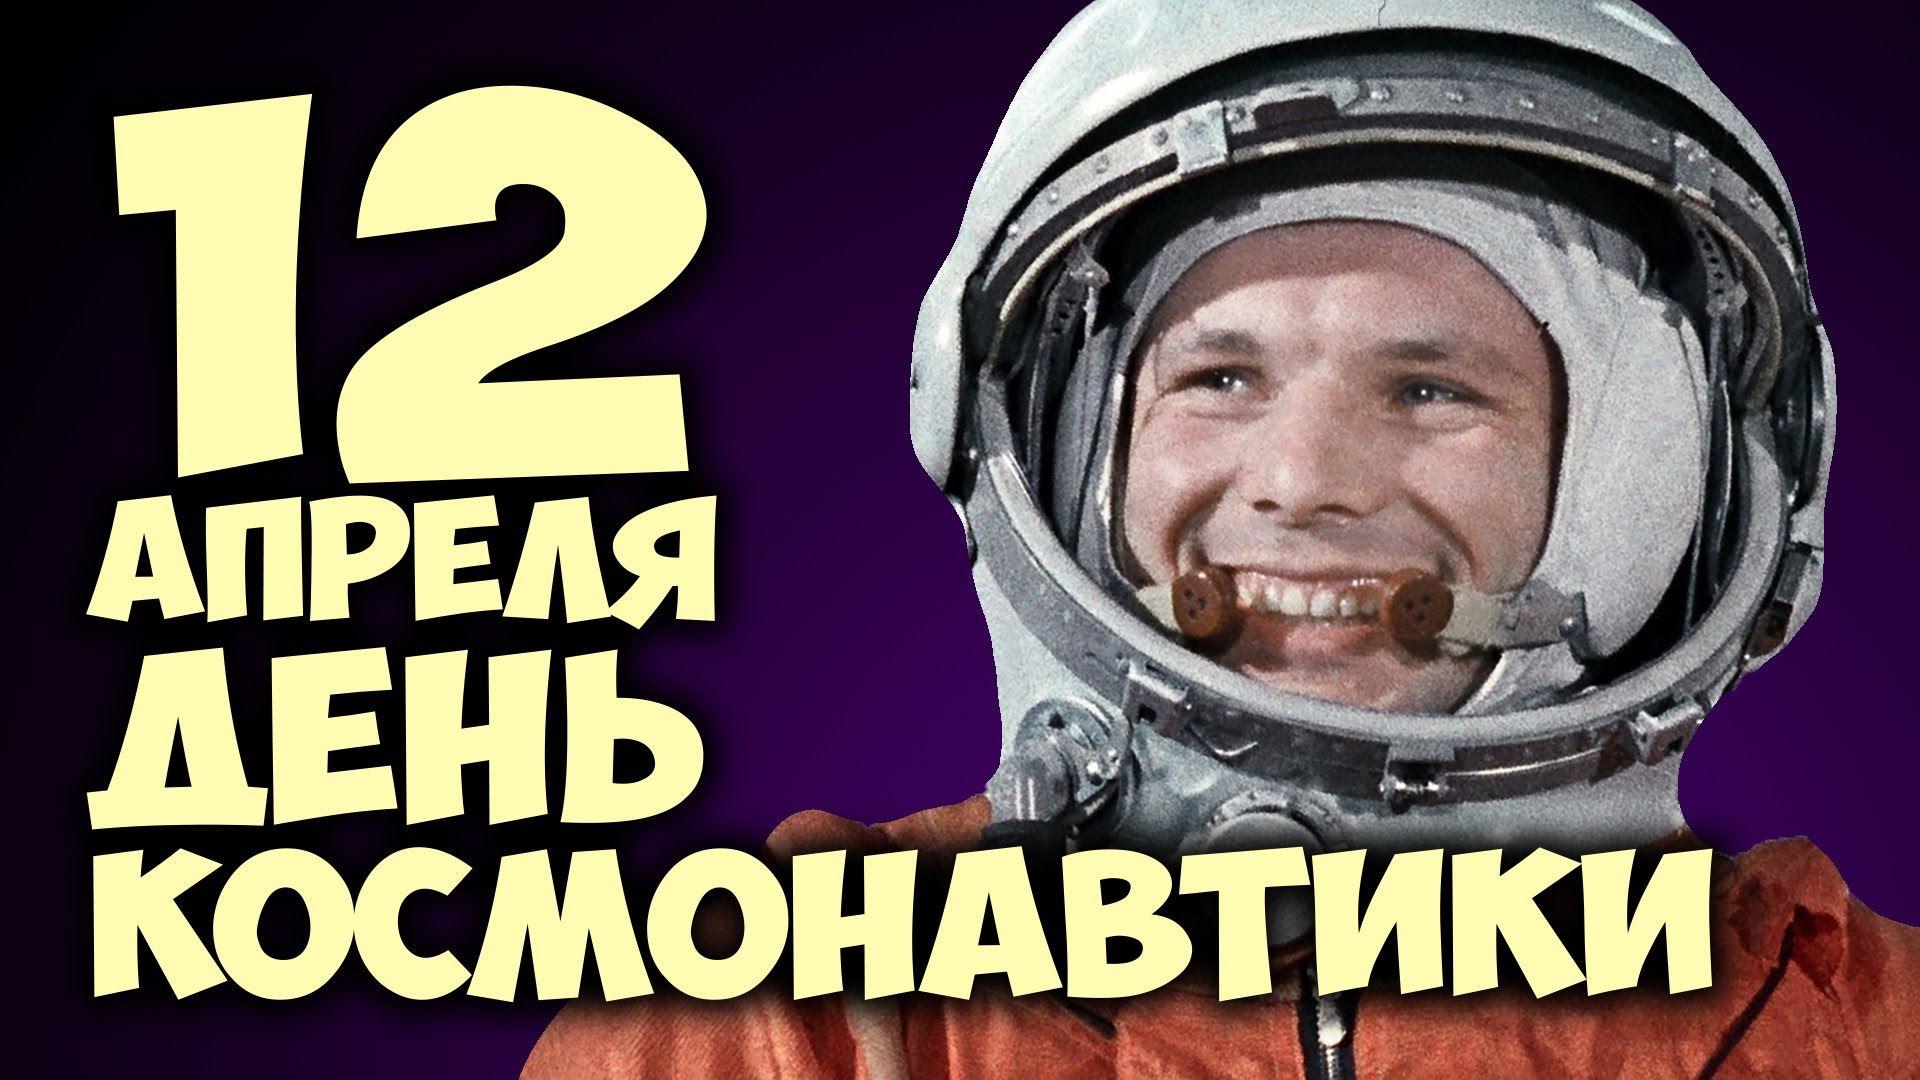 Team RichMonkey.biz congratulates you on the day of astronautics!